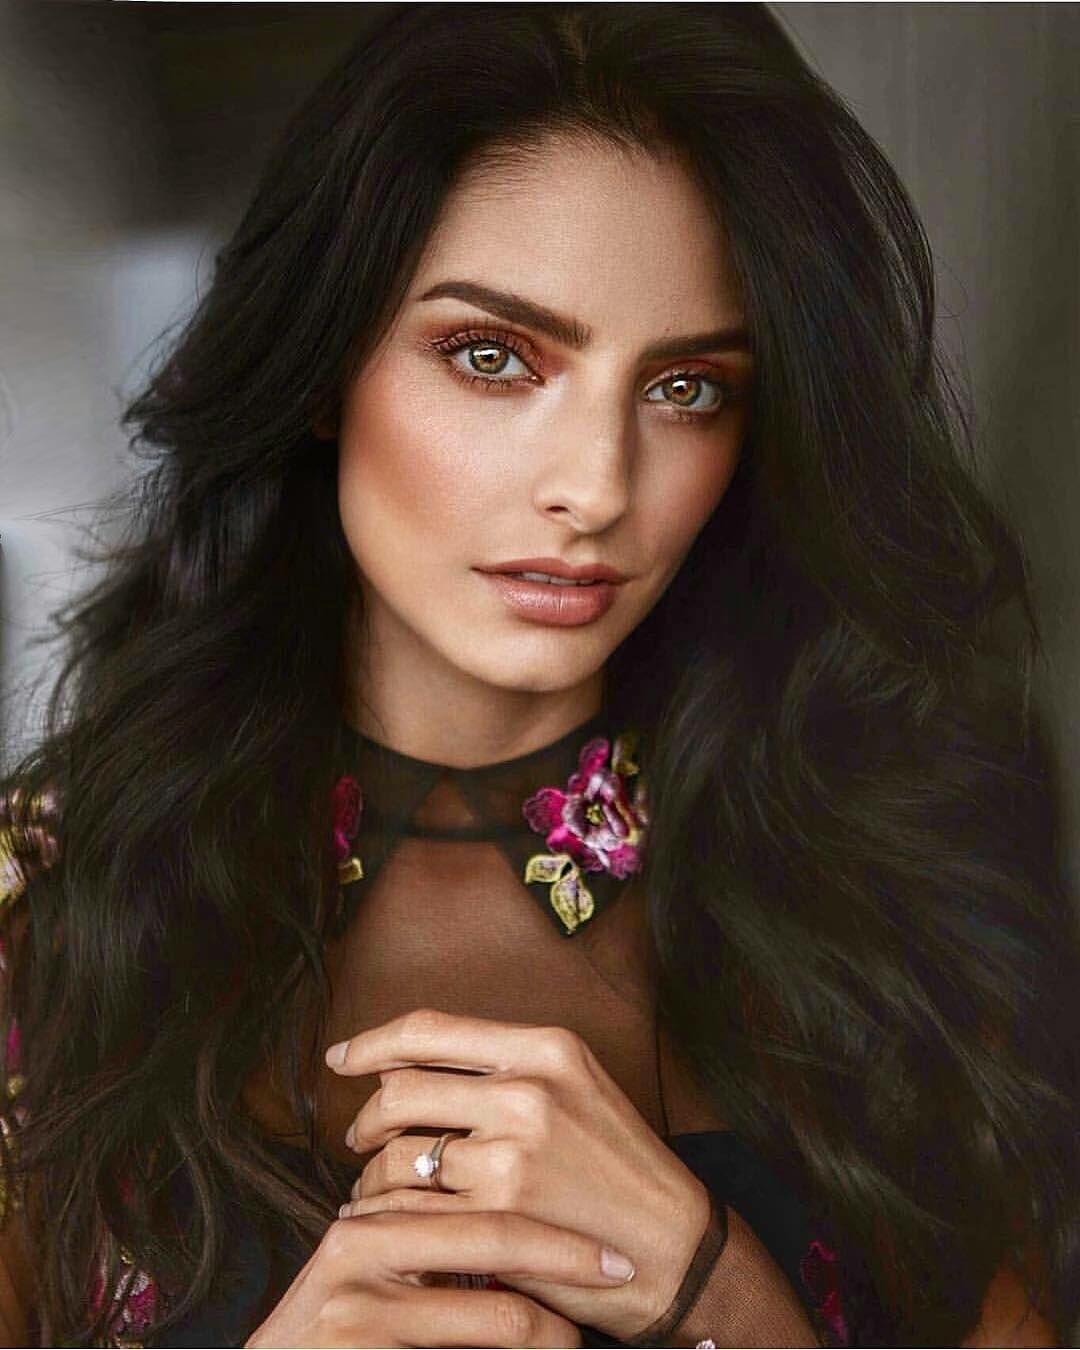 Pin By Sydney Prosenick On Makeup Bold Makeup Looks Mexican Models Brunette Beauty